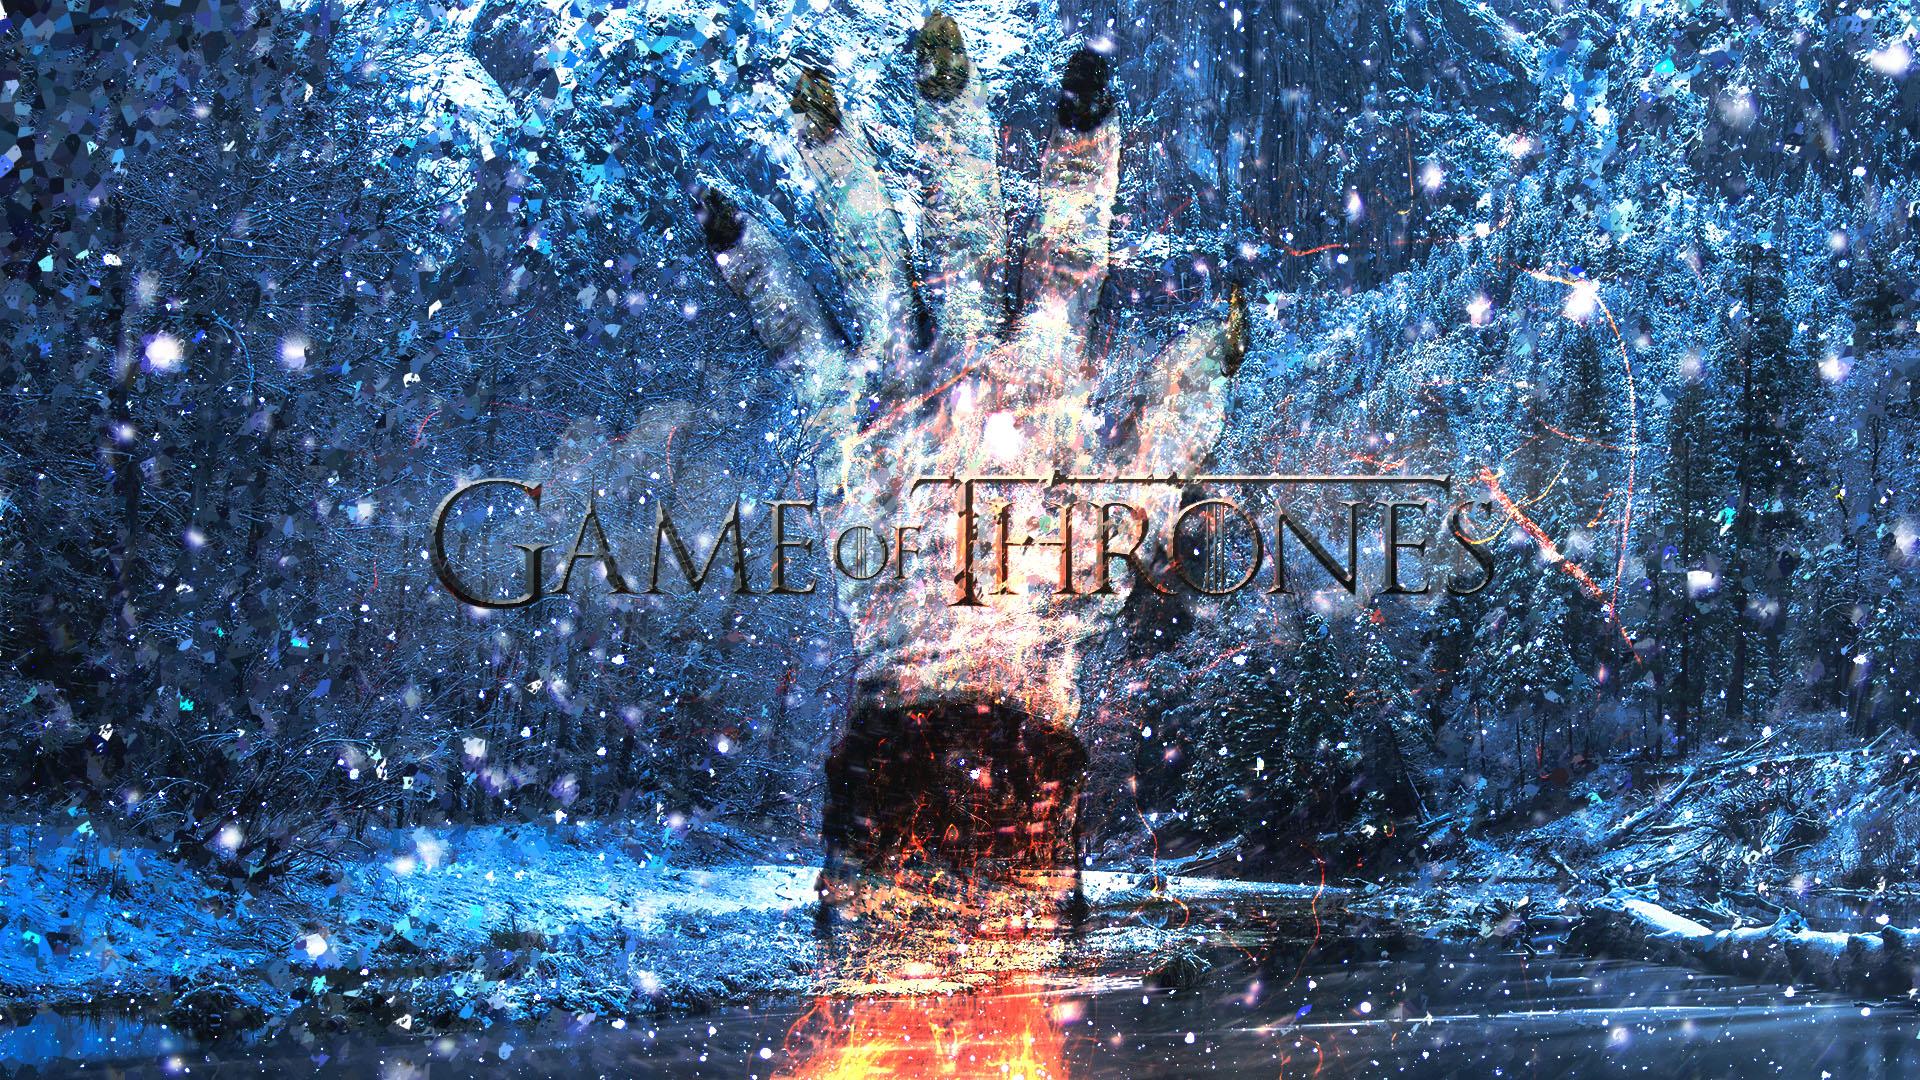 4k Game Of Thrones Wallpaper: Game Of Thrones Logo Art, HD Tv Shows, 4k Wallpapers